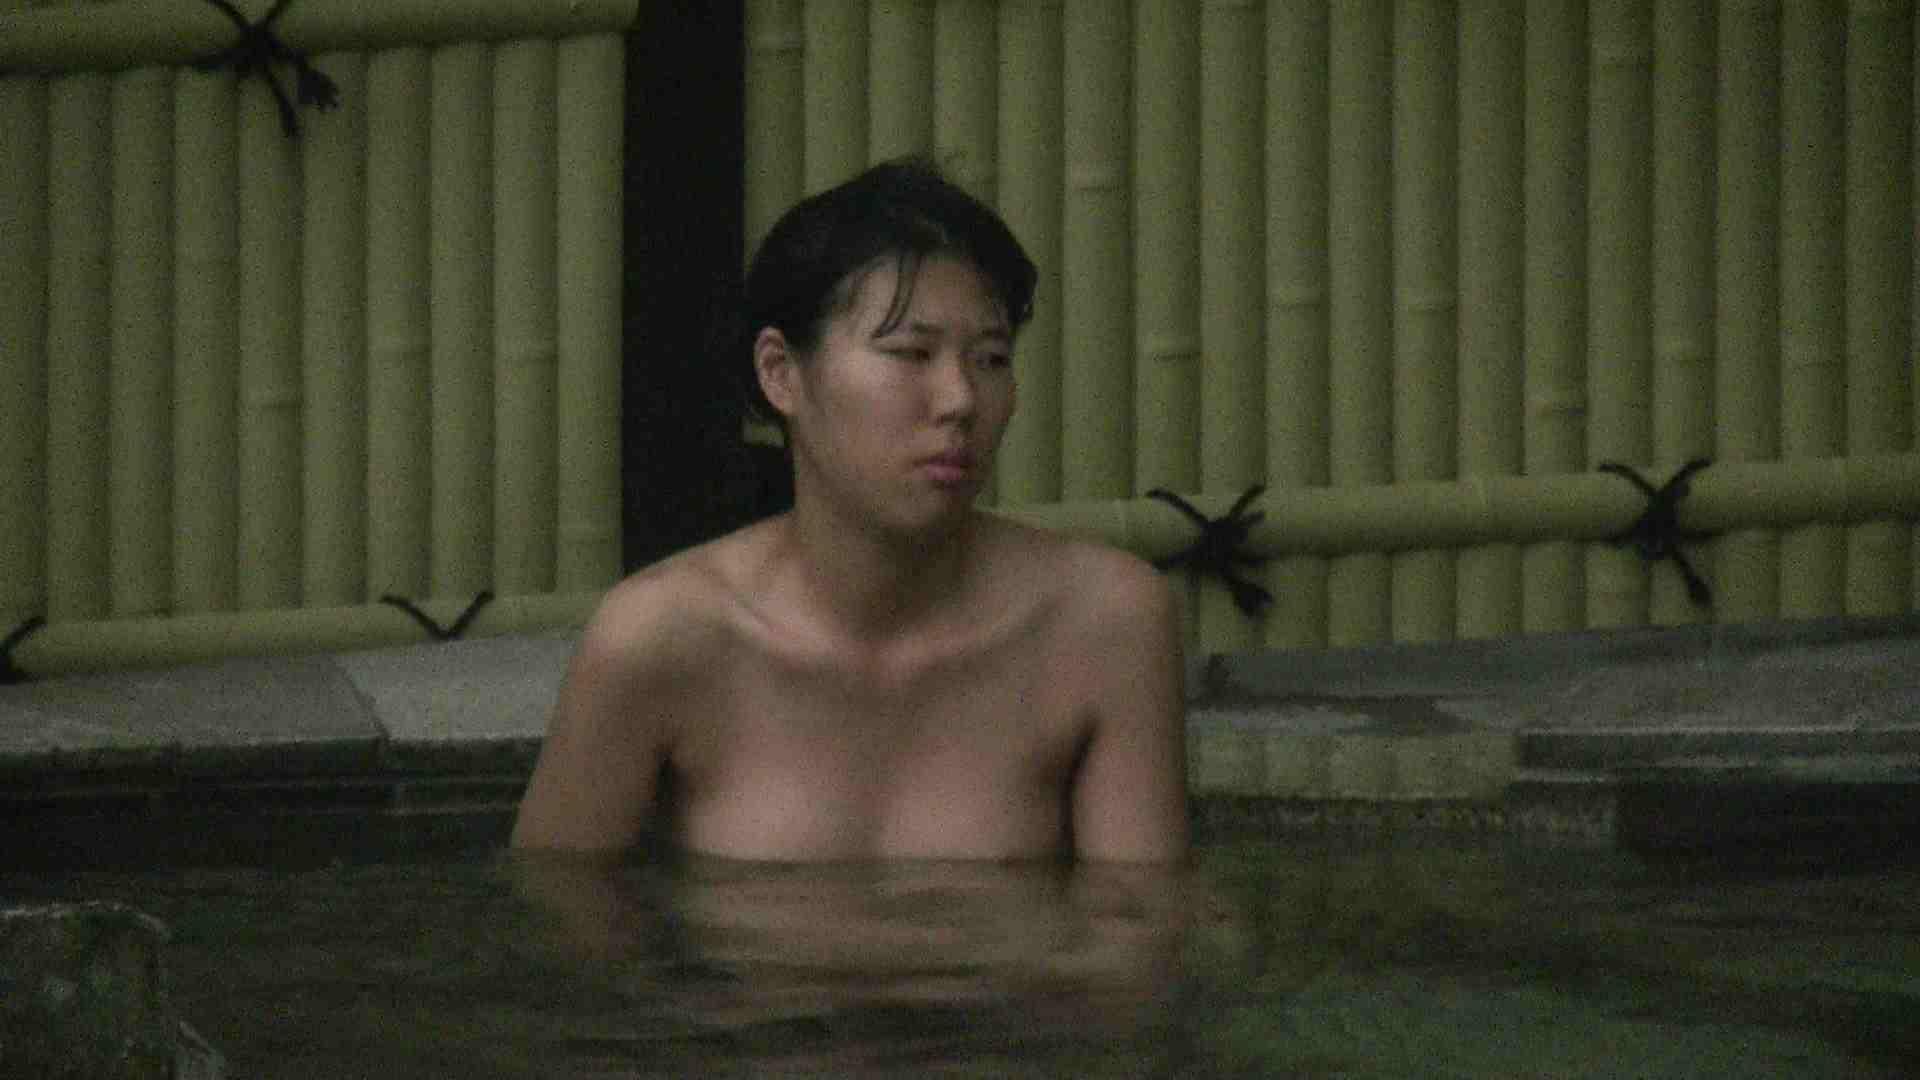 Aquaな露天風呂Vol.215 綺麗なOLたち  106枚 69